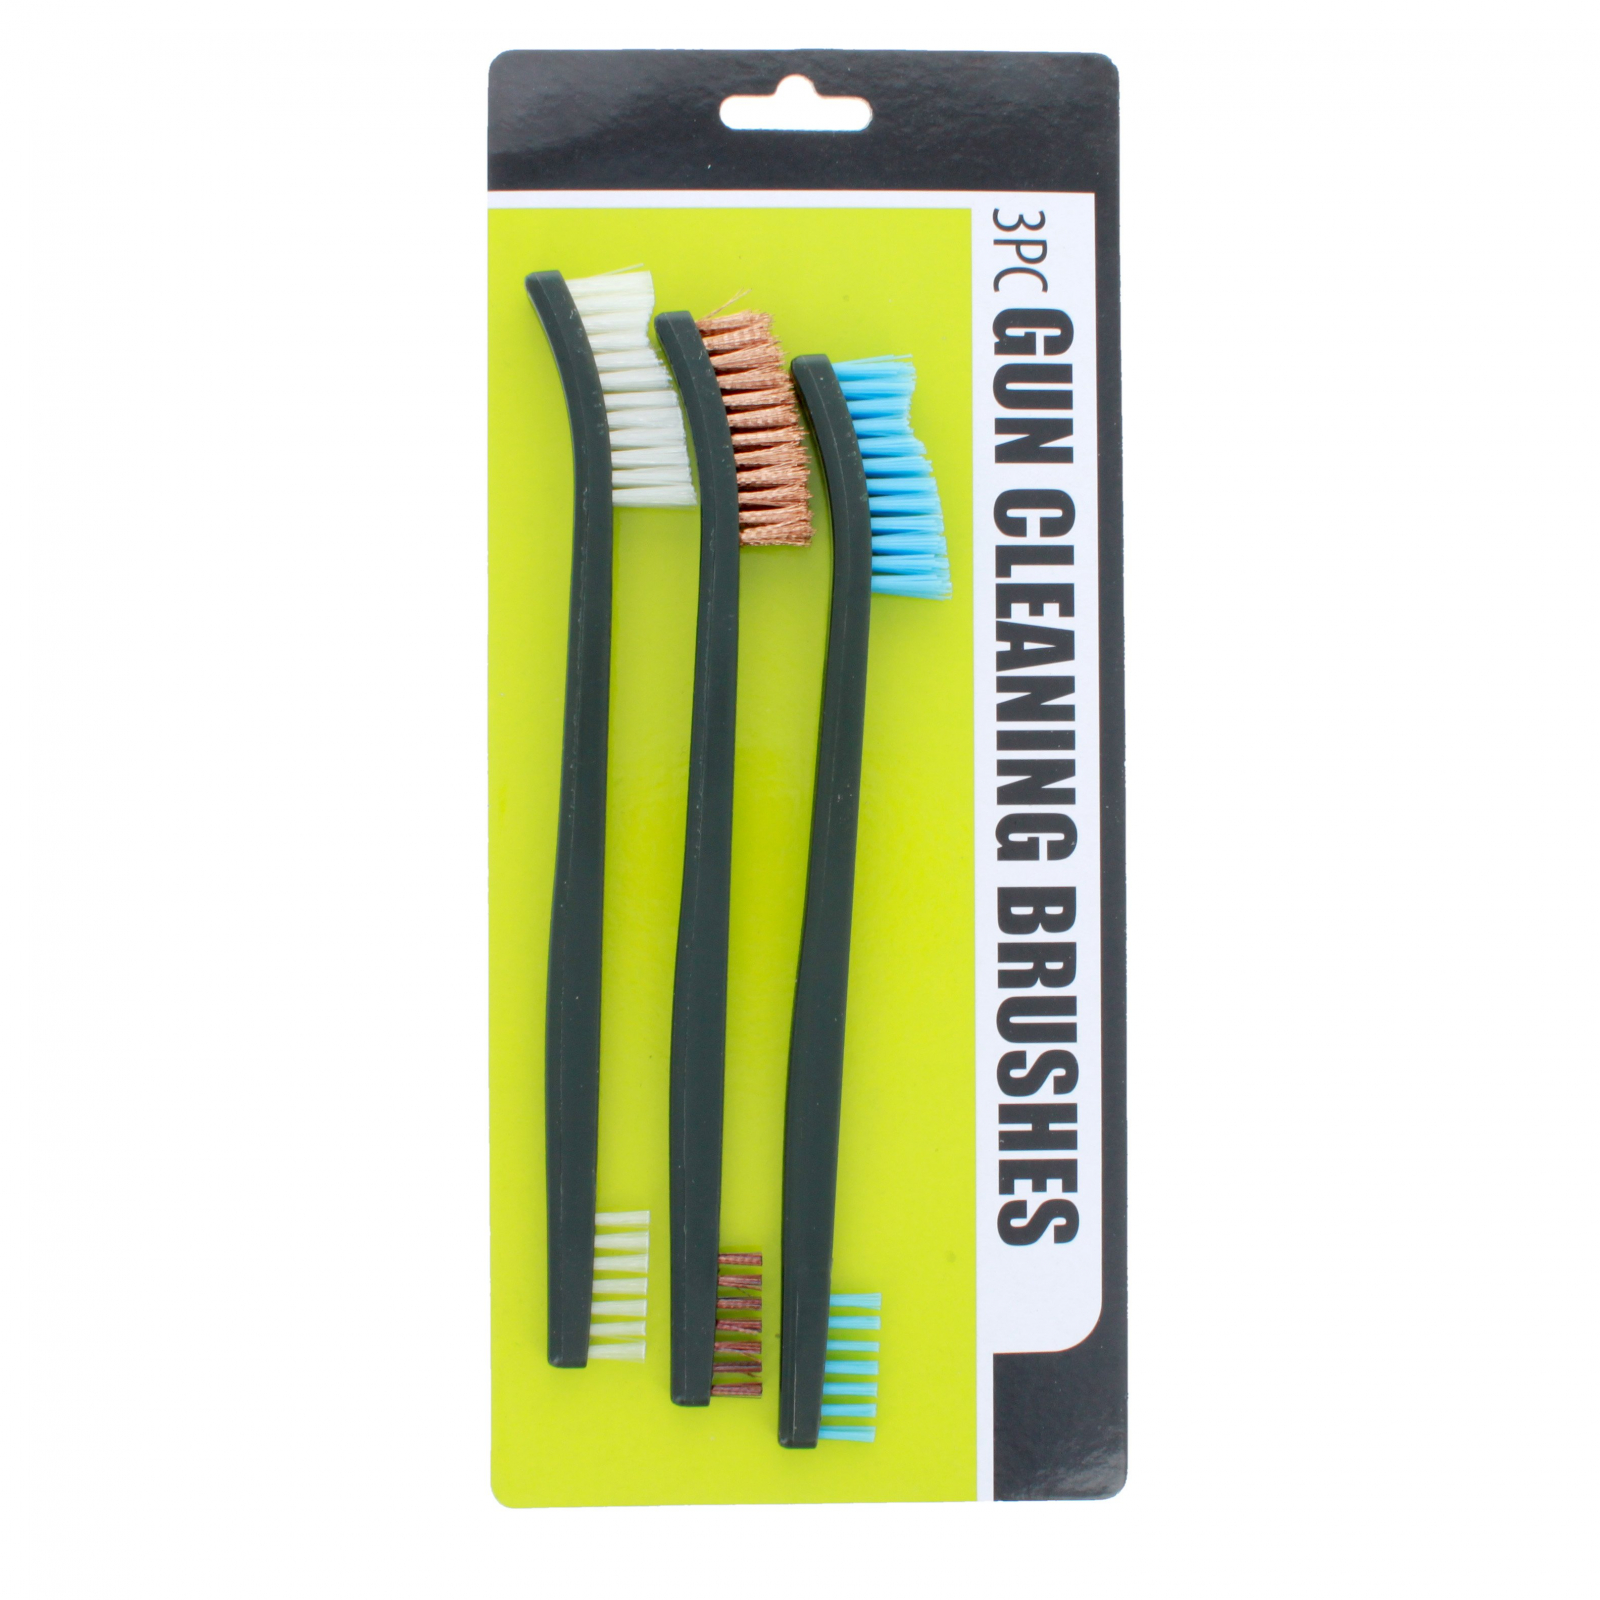 ASR Outdoor Gun Cleaning Brushes 3 Piece Set Bristle Variety